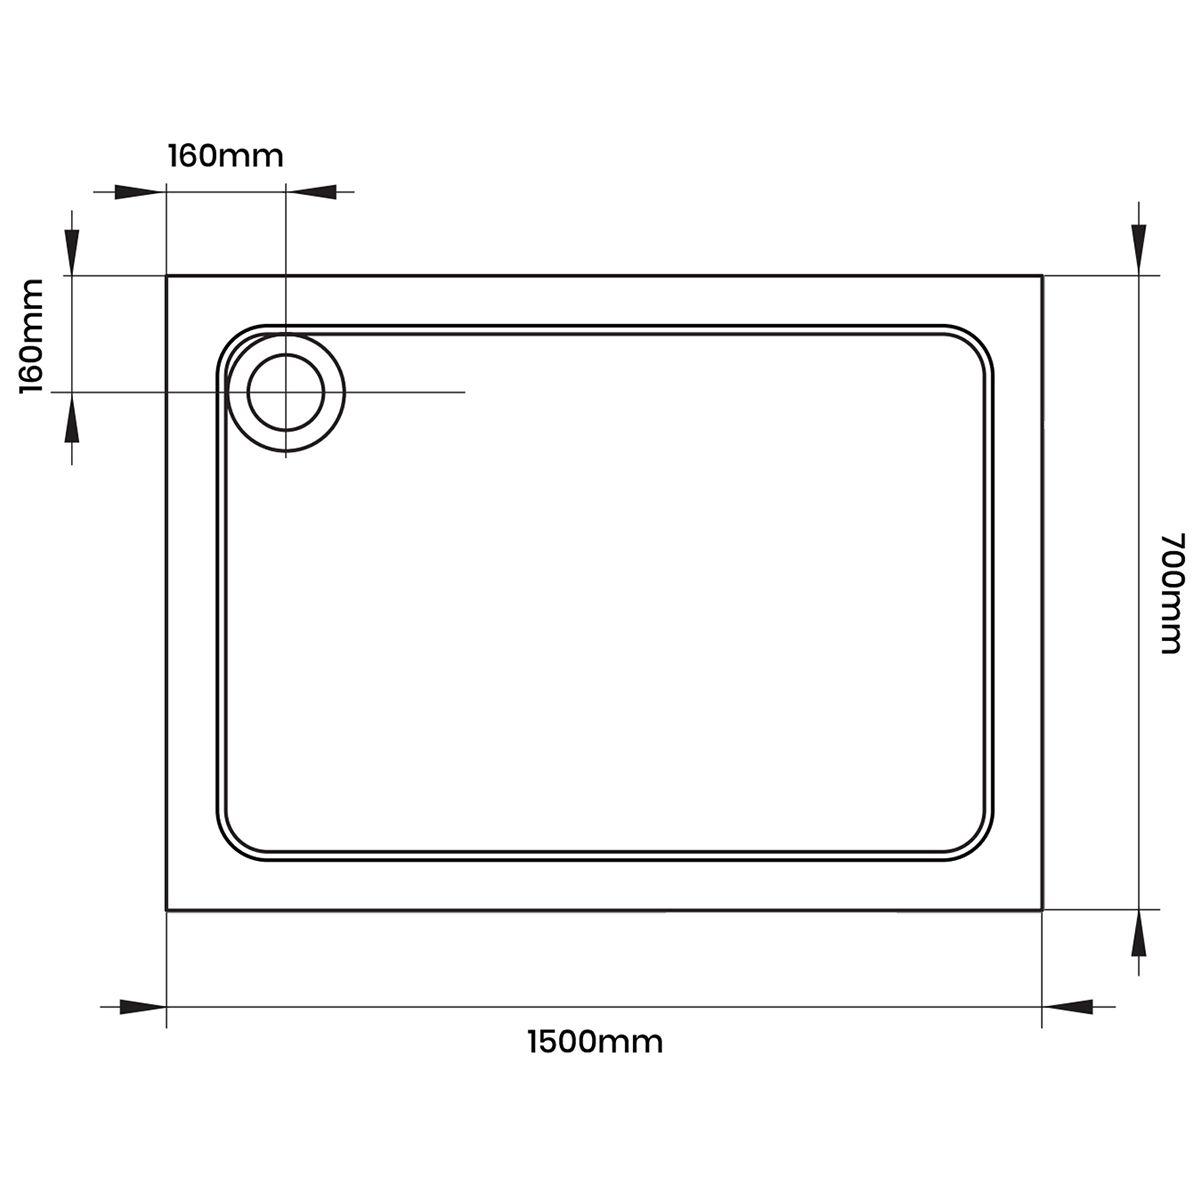 Aquadart Rectangular 1500 x 700 Shower Tray